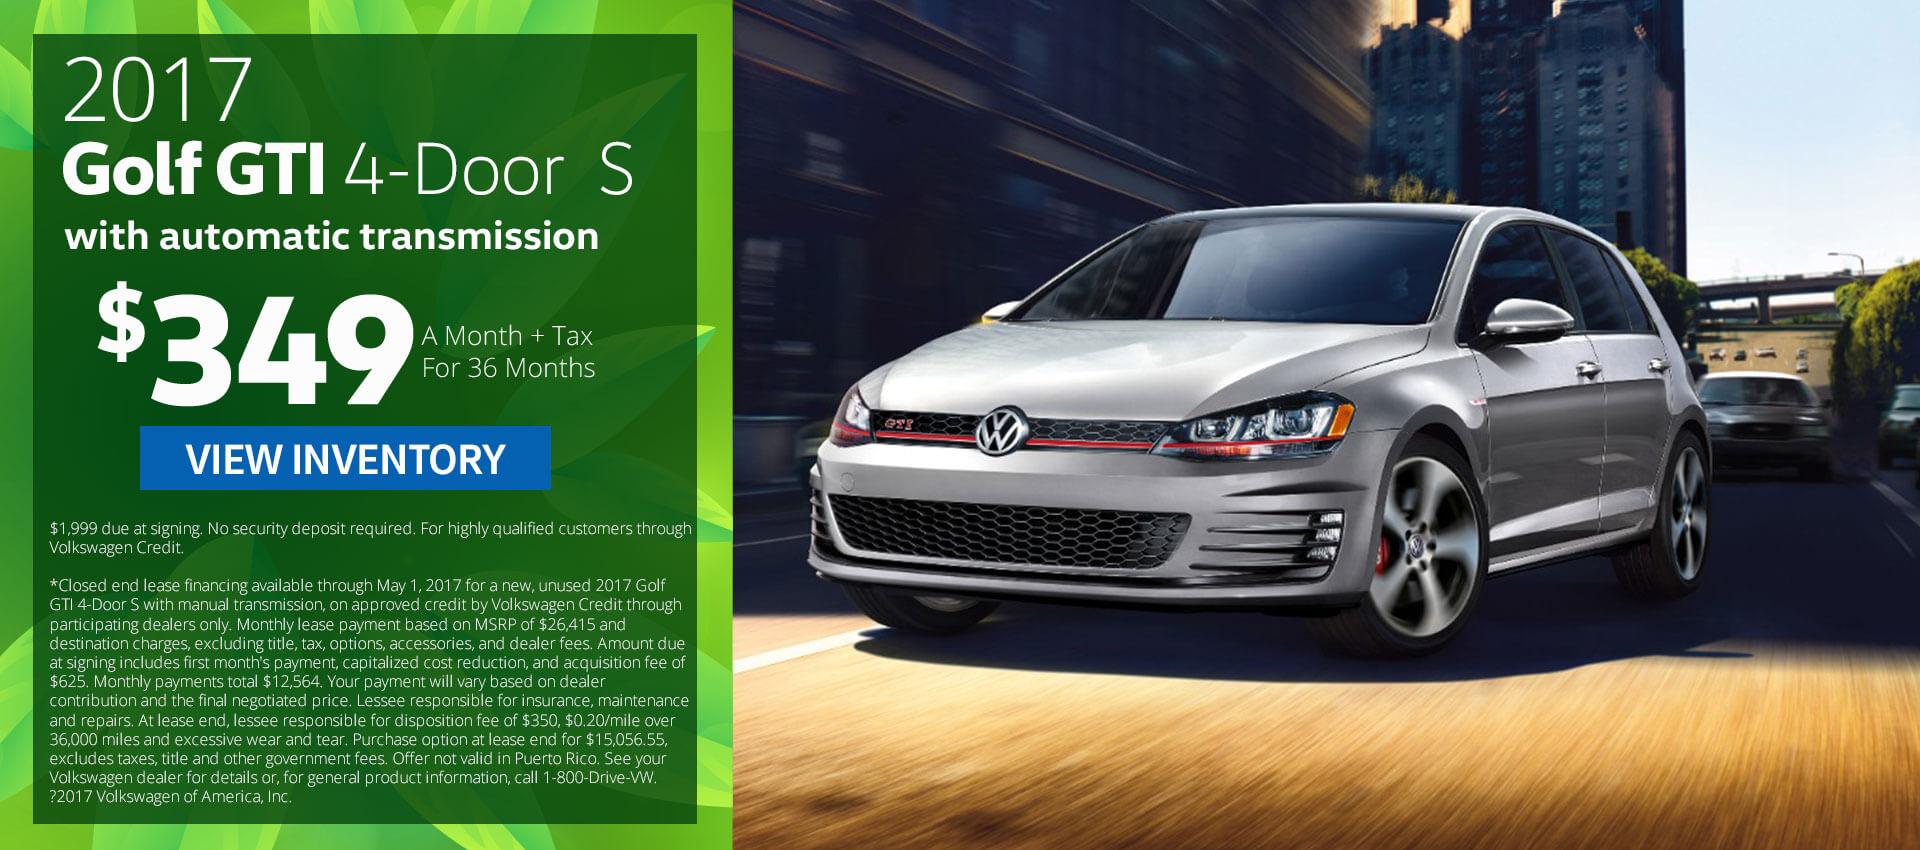 Golf GTI HP